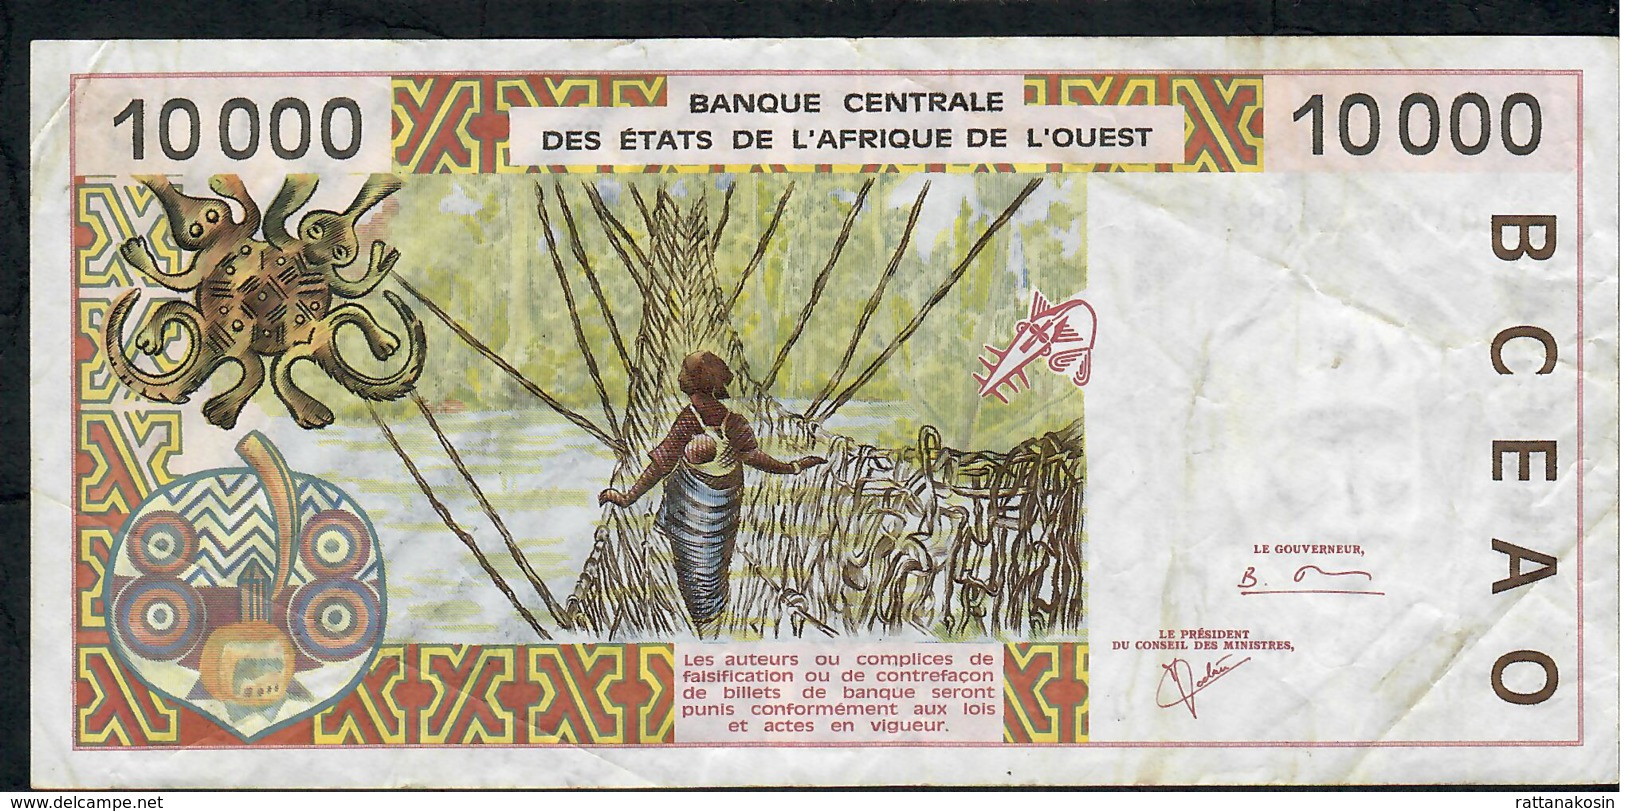 W.A.S. TOGO  P814Tj 10000 Or 10.000 FRANCS (20)01 2001  VF NO P.h. - Westafrikanischer Staaten